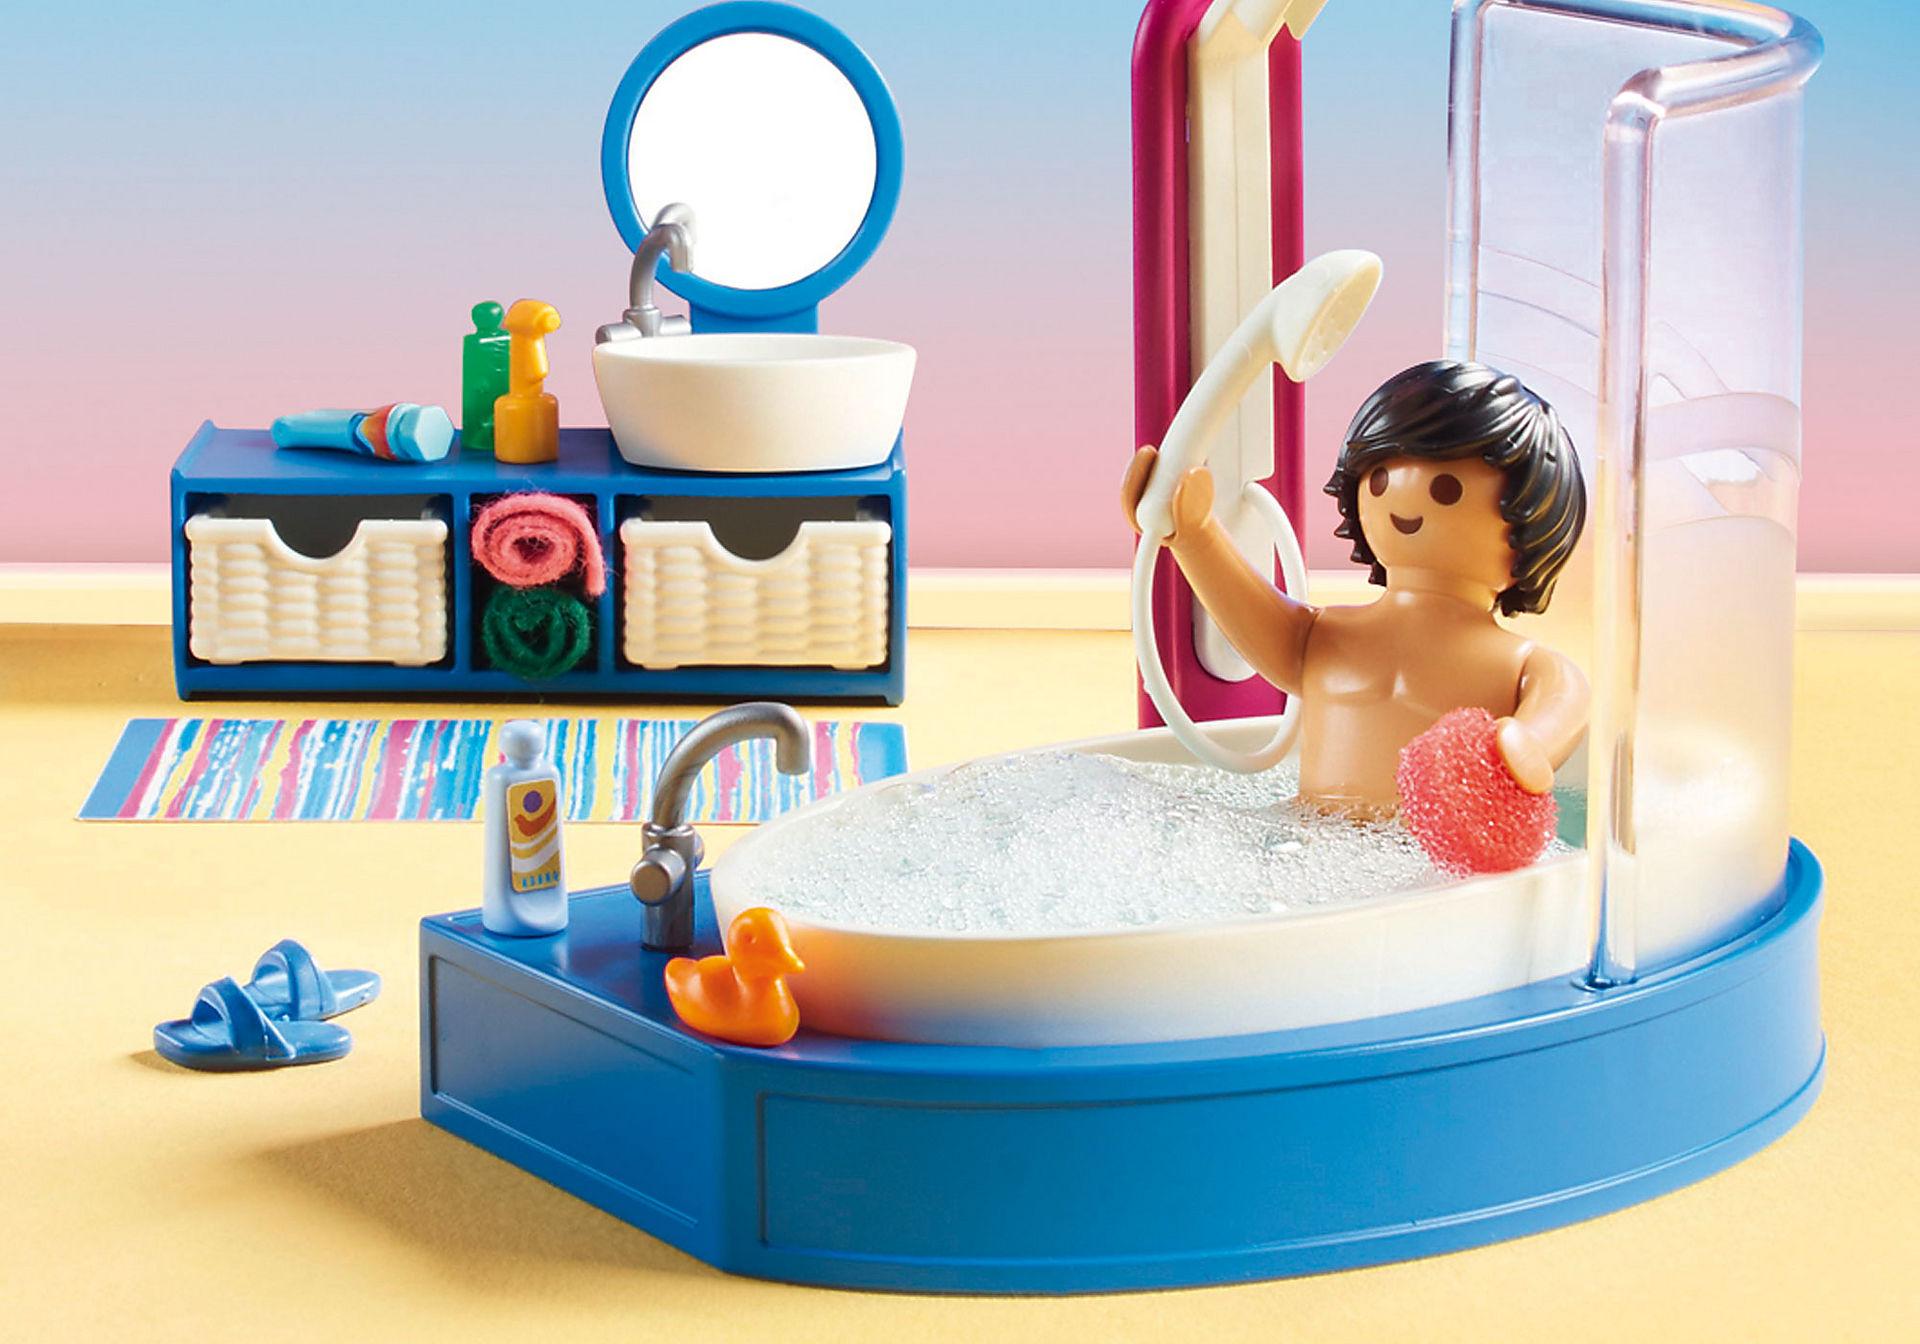 70211 Bathroom with Tub zoom image5